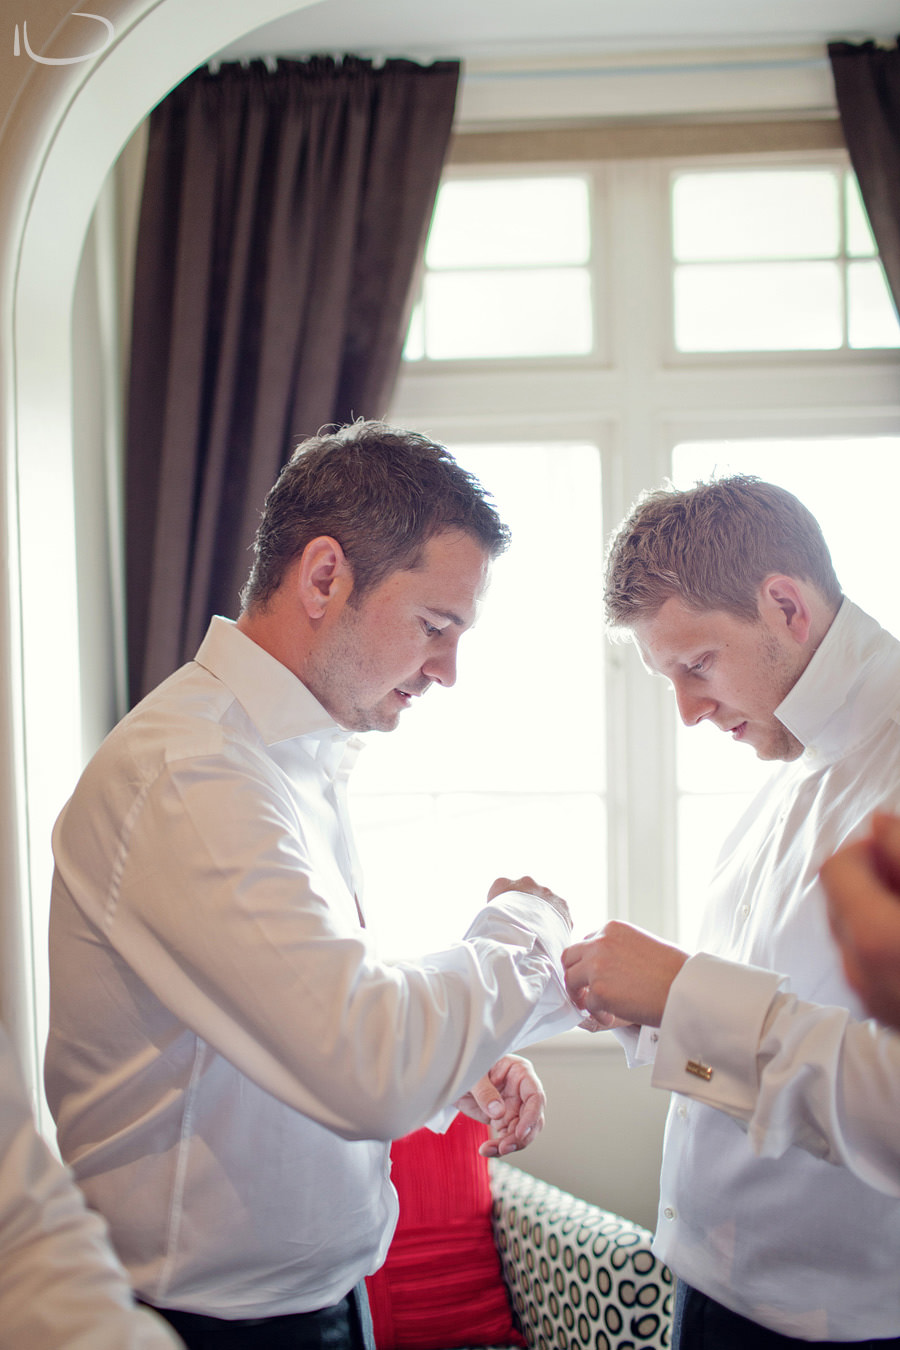 Sydney Wedding Photographer: Groom & groomsman putting on cufflinks